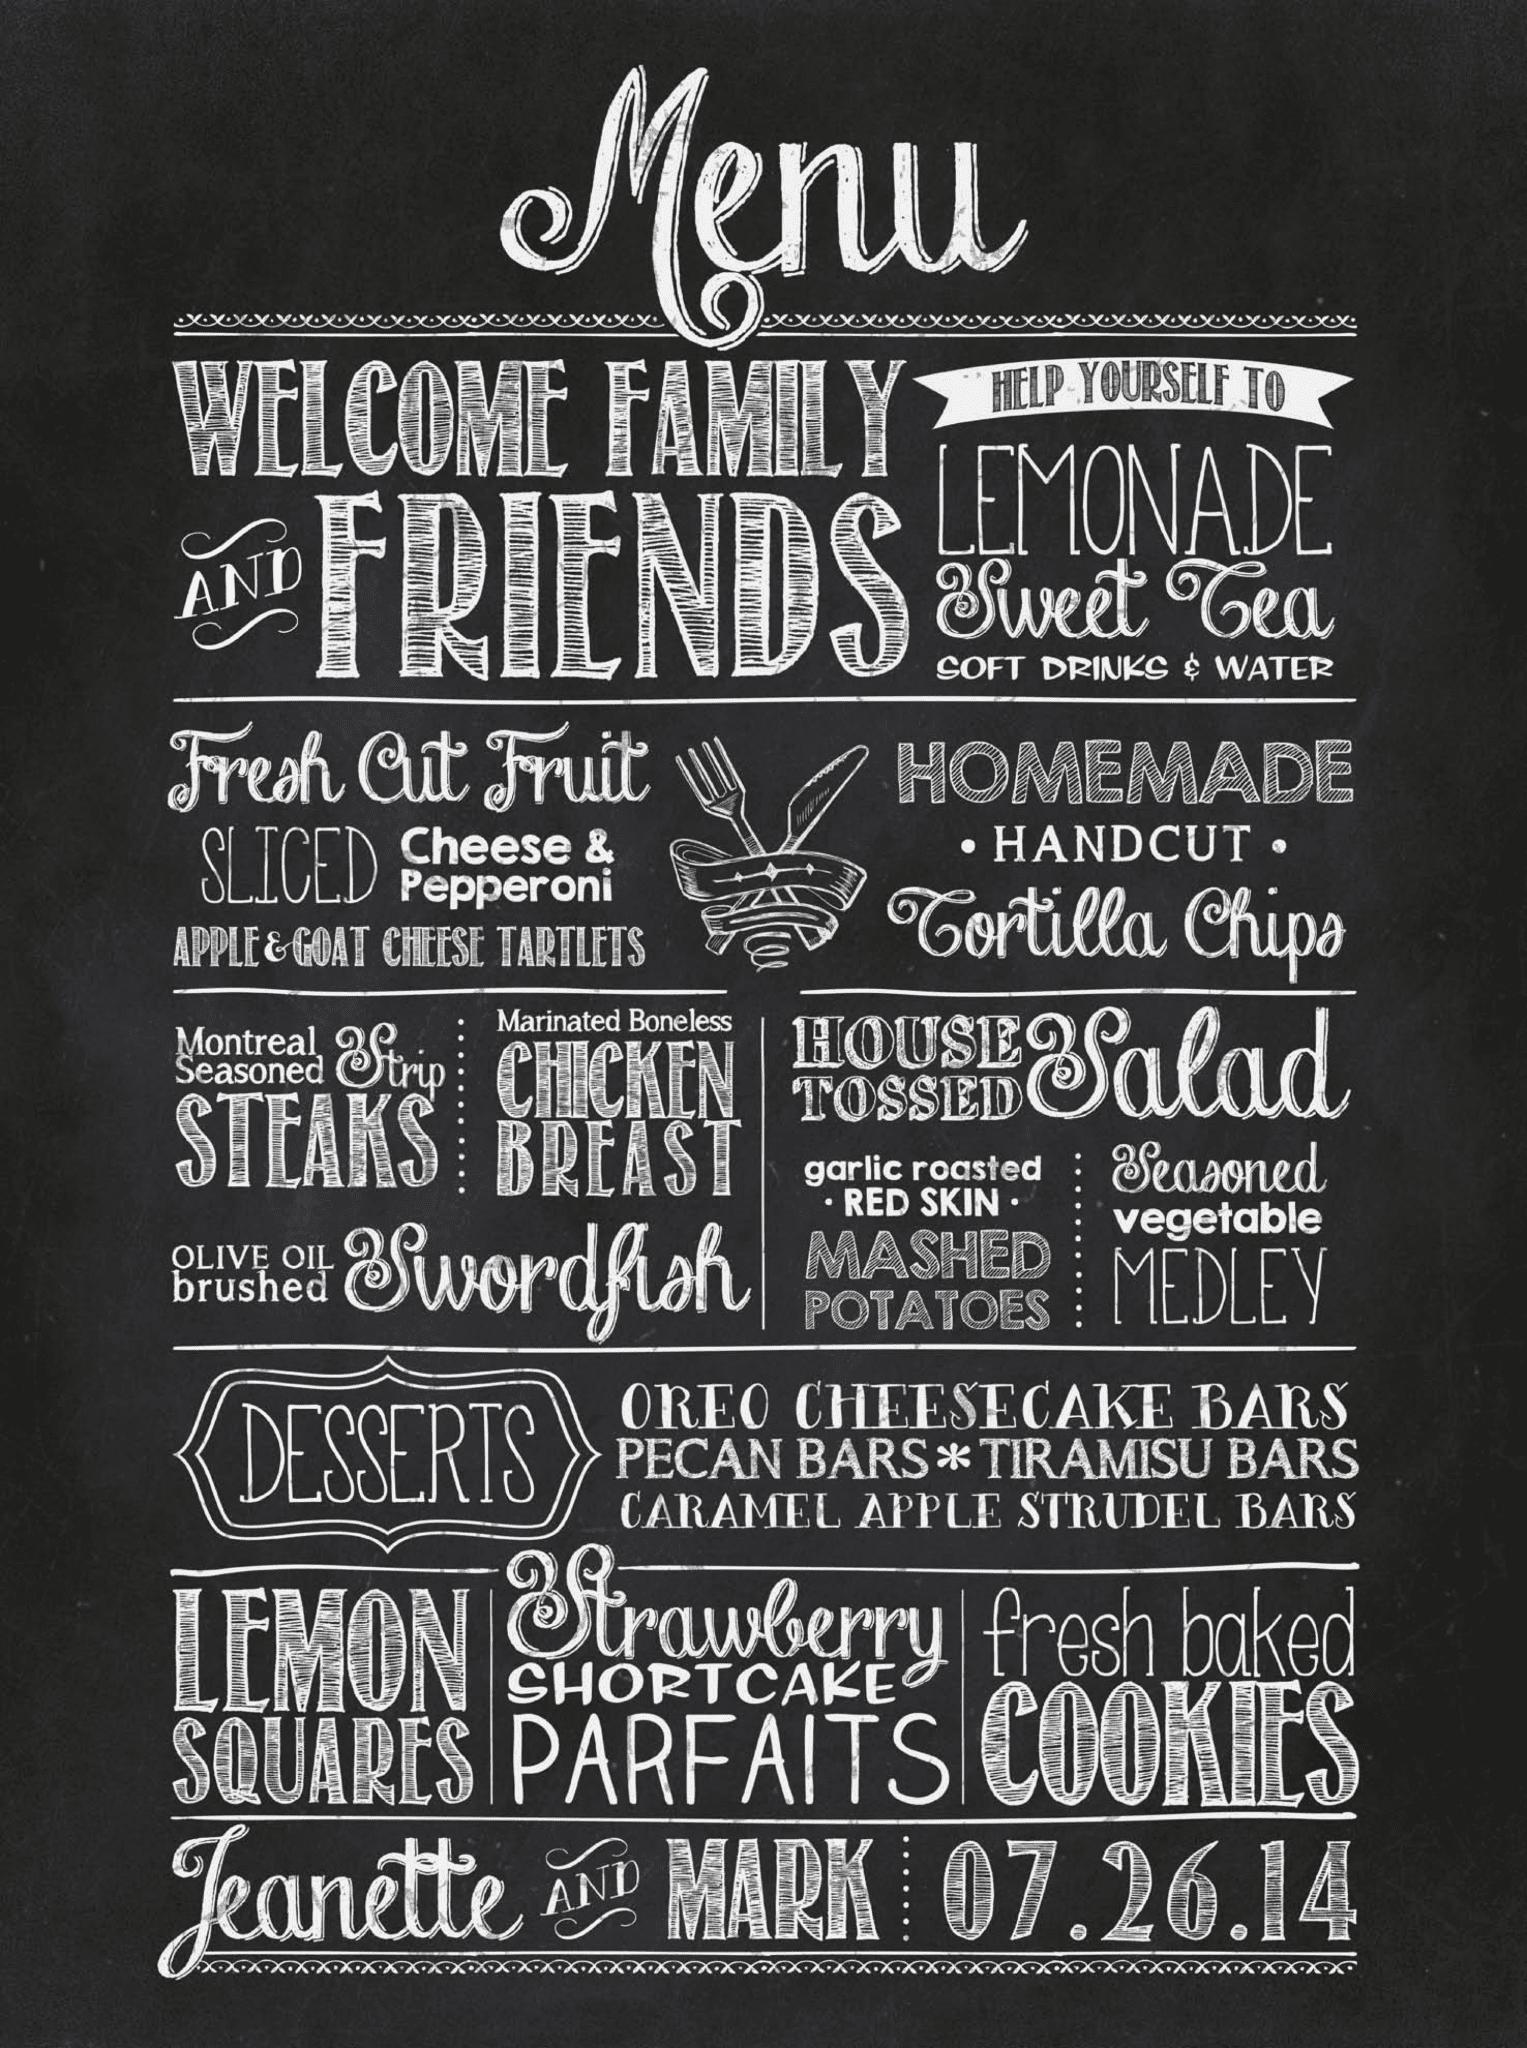 chalkboard menu photo album home design ideas - Chalkboard Designs Ideas